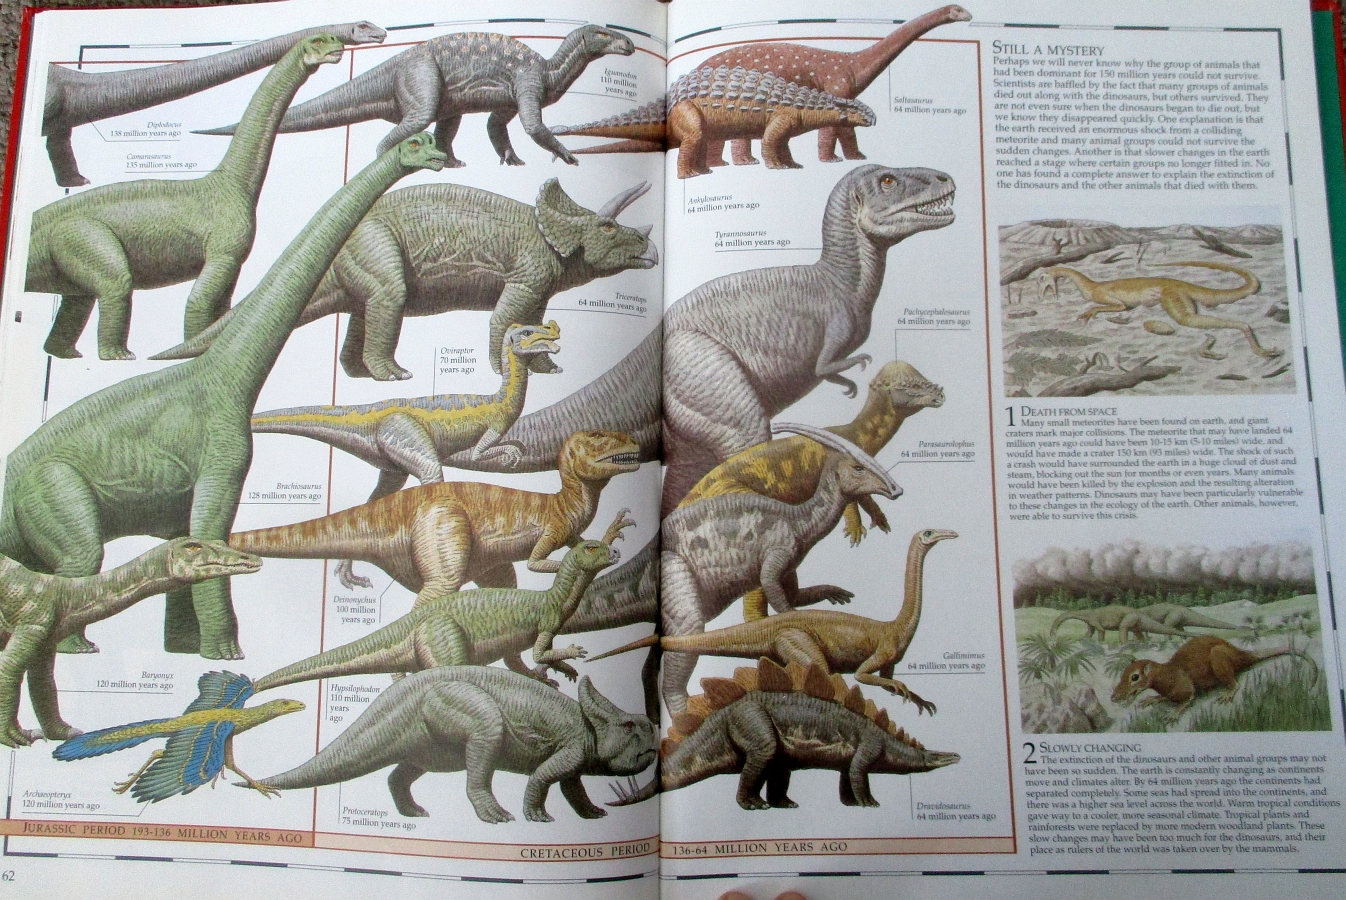 Great Dinosaur Atlas - March to Extinction 2